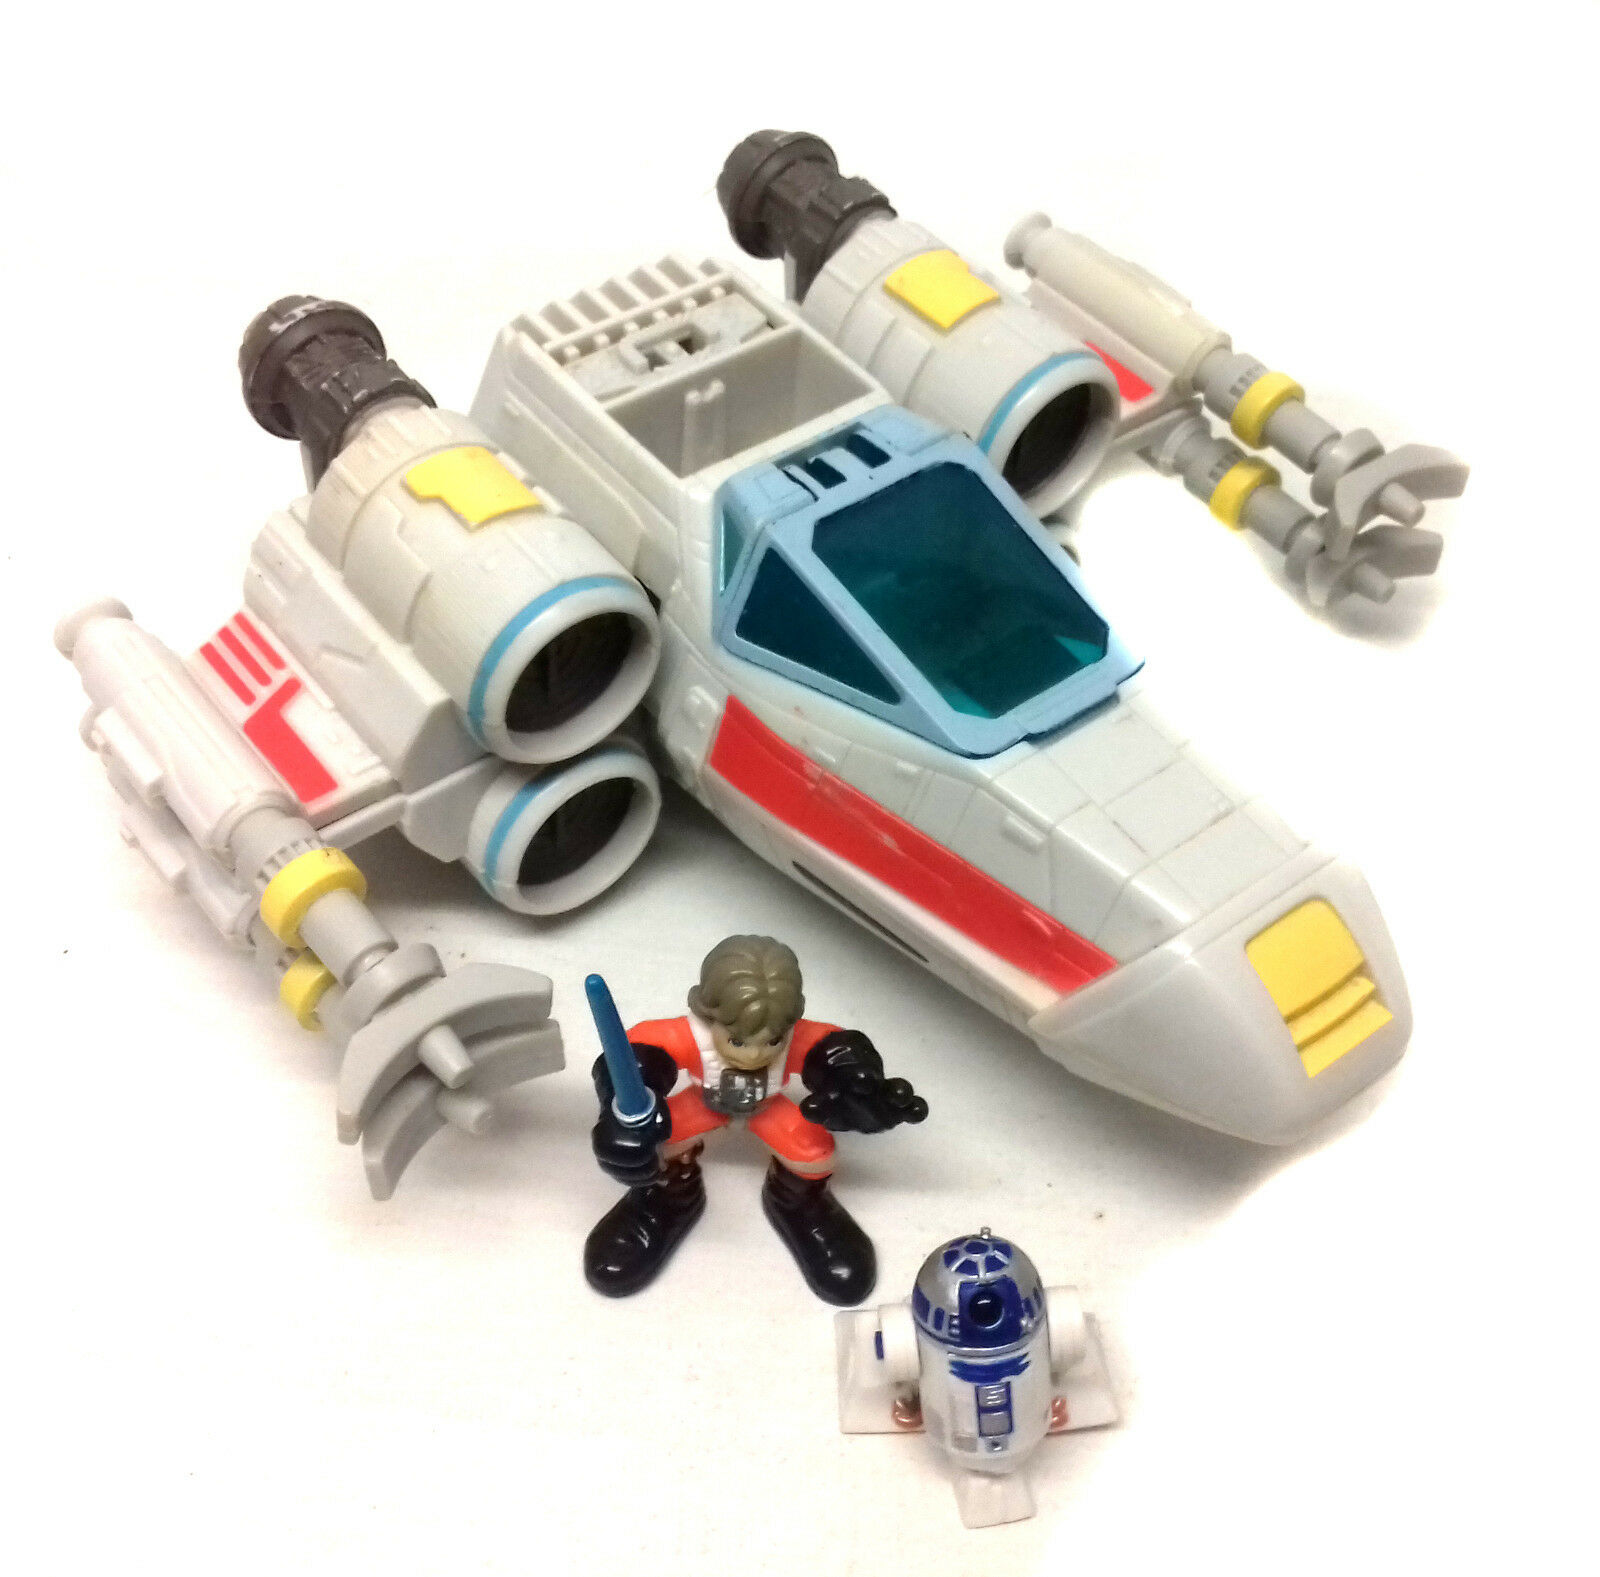 Star Wars Galactic Galactic Galactic Heroes Playskool X WING FIGHTER vehicle toy + LUKE toy figure 0dd044